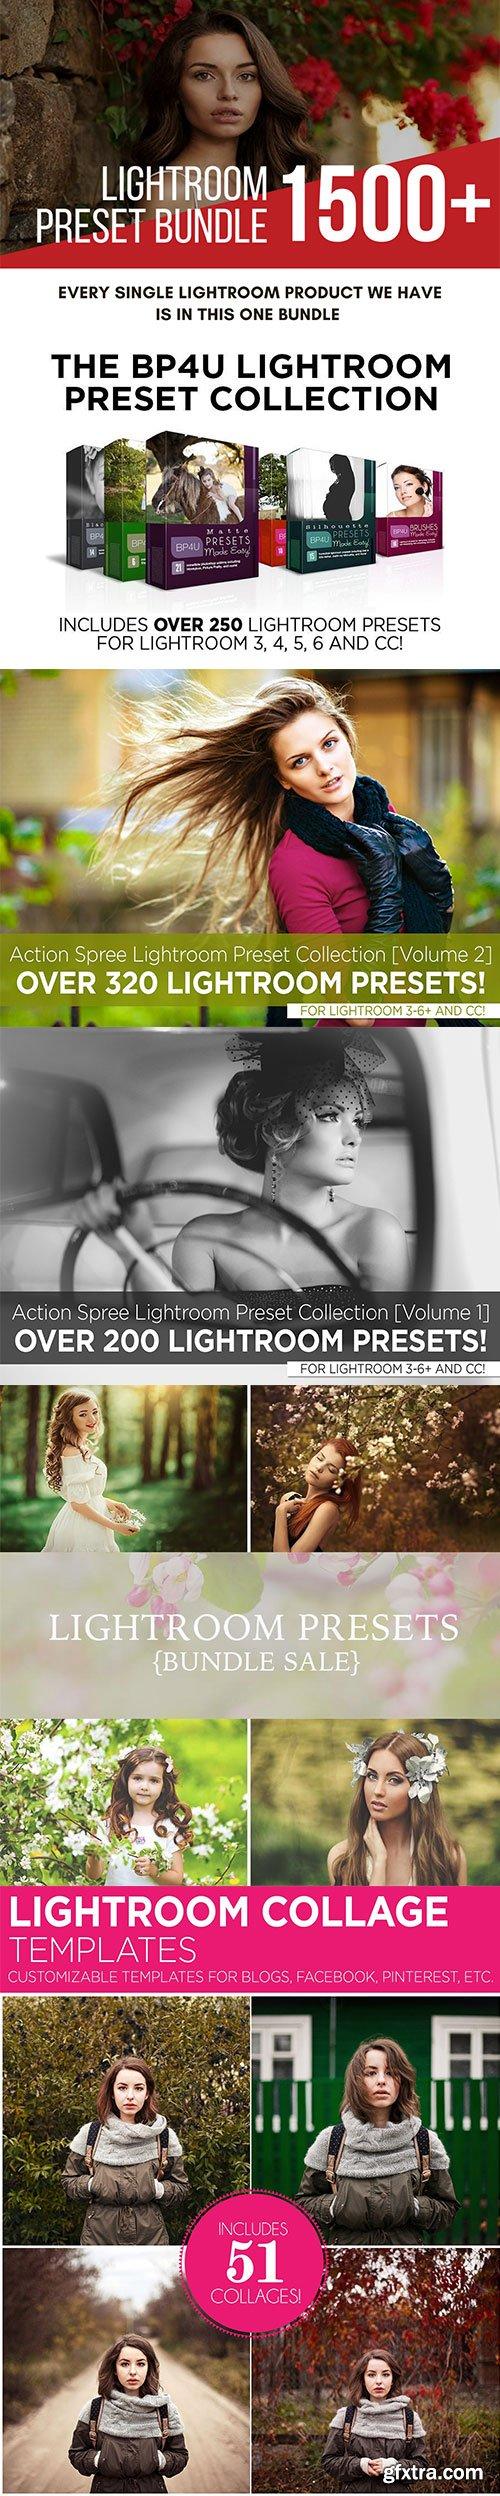 1500+ Lightroom Presets + BONUS - BRAND NEW BUNDLE